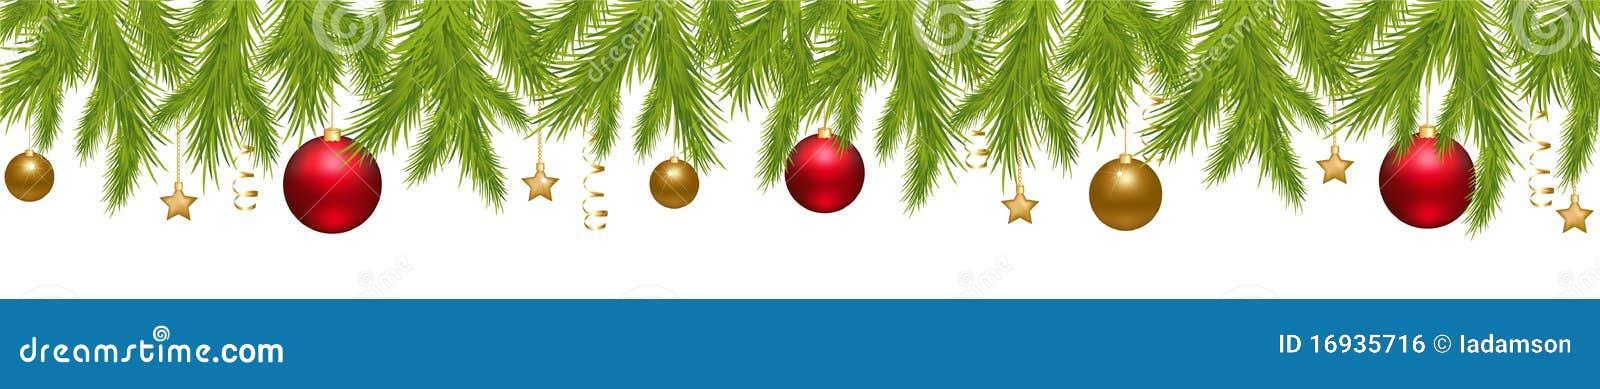 Merry Christmas Clip Art Banners